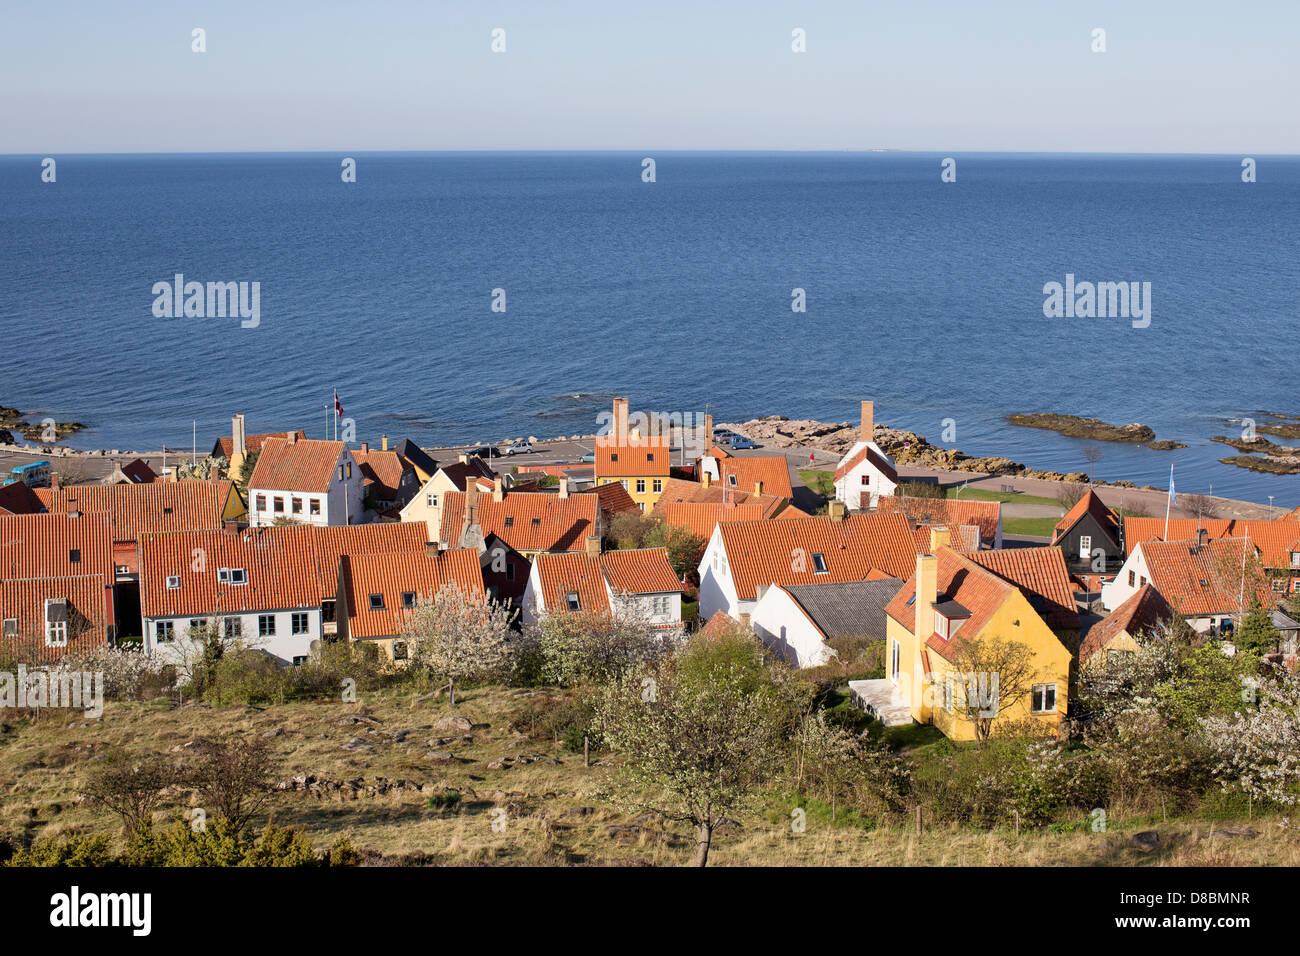 Gudhjem at the Baltic Coast on the island Bornholm, Denmark Stock Photo